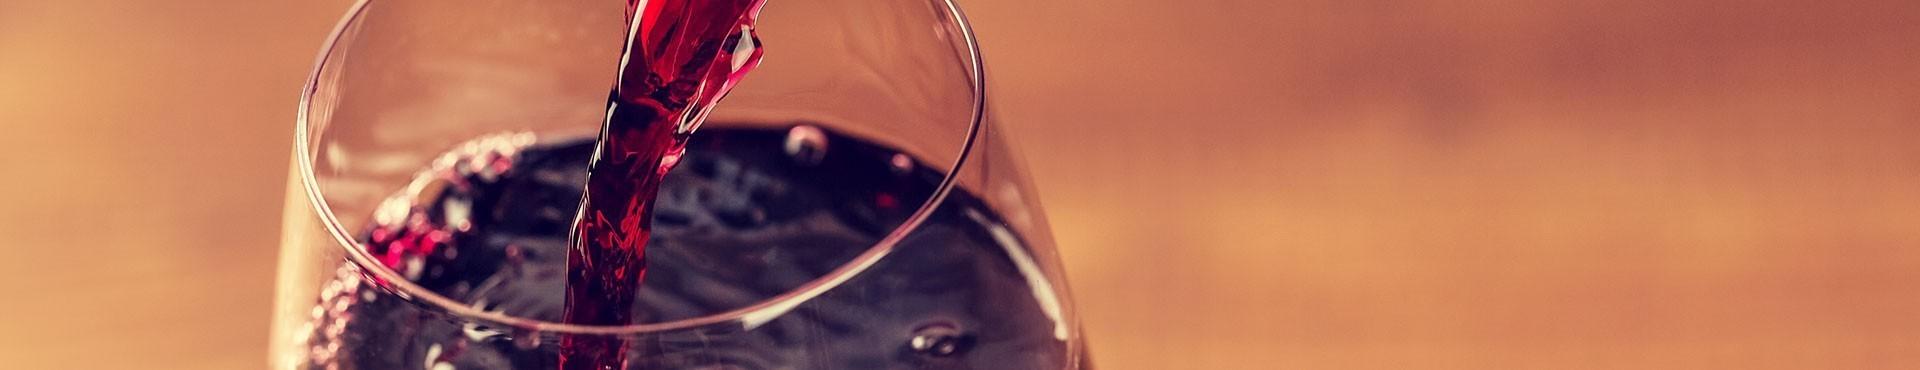 Nos vins rouges de Bourgogne - OnWine